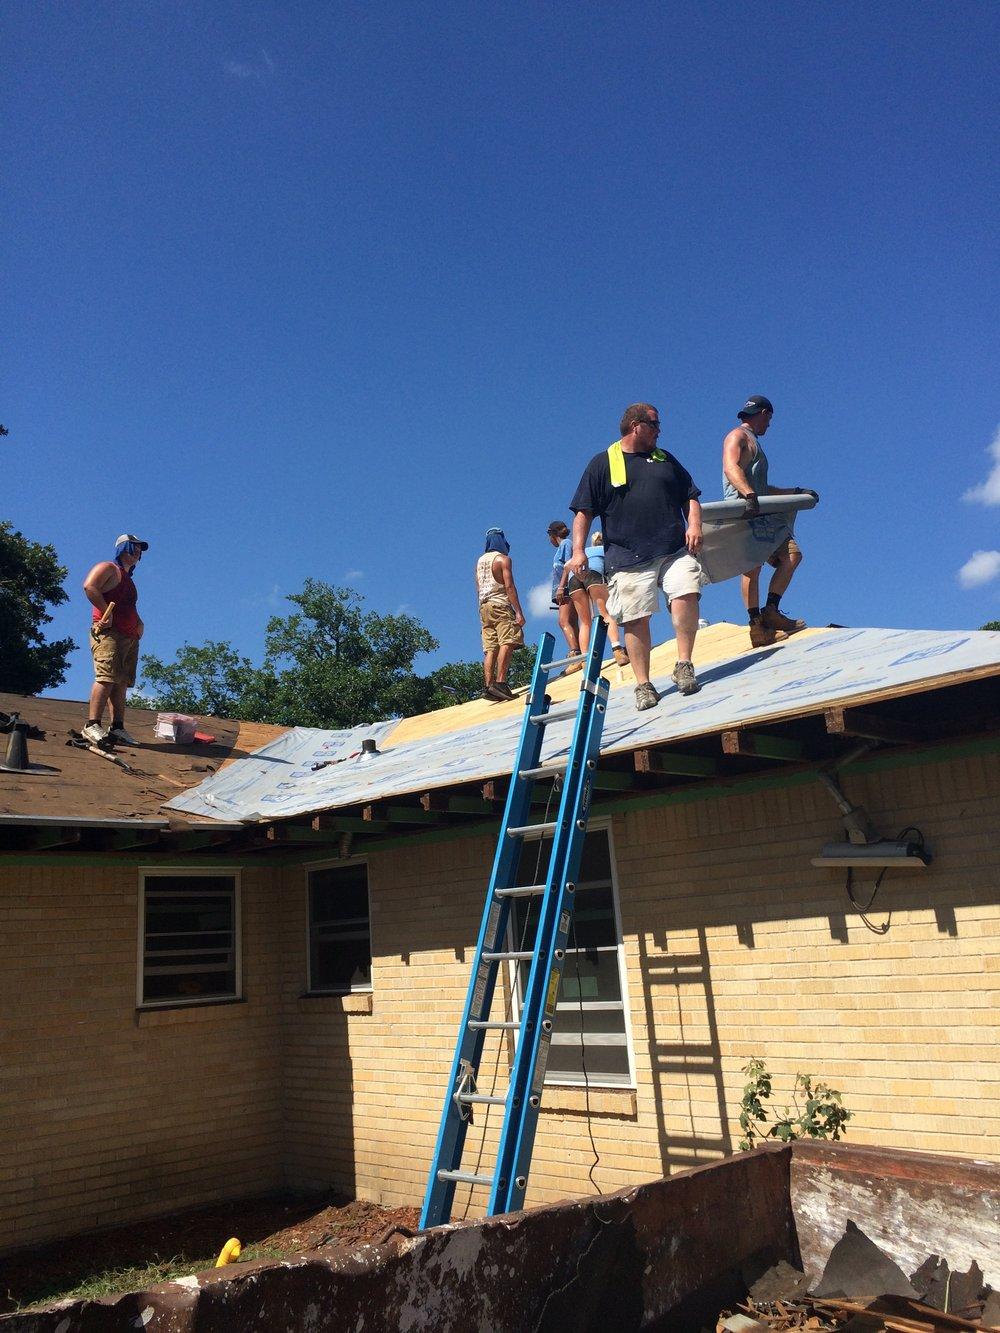 Photo credit: Disciples Volunteering   Volunteer teams at the Disciples Volunteering Mission Station in Texas City are repairing homes damaged by Hurricane Harvey in Galveston County, TX.